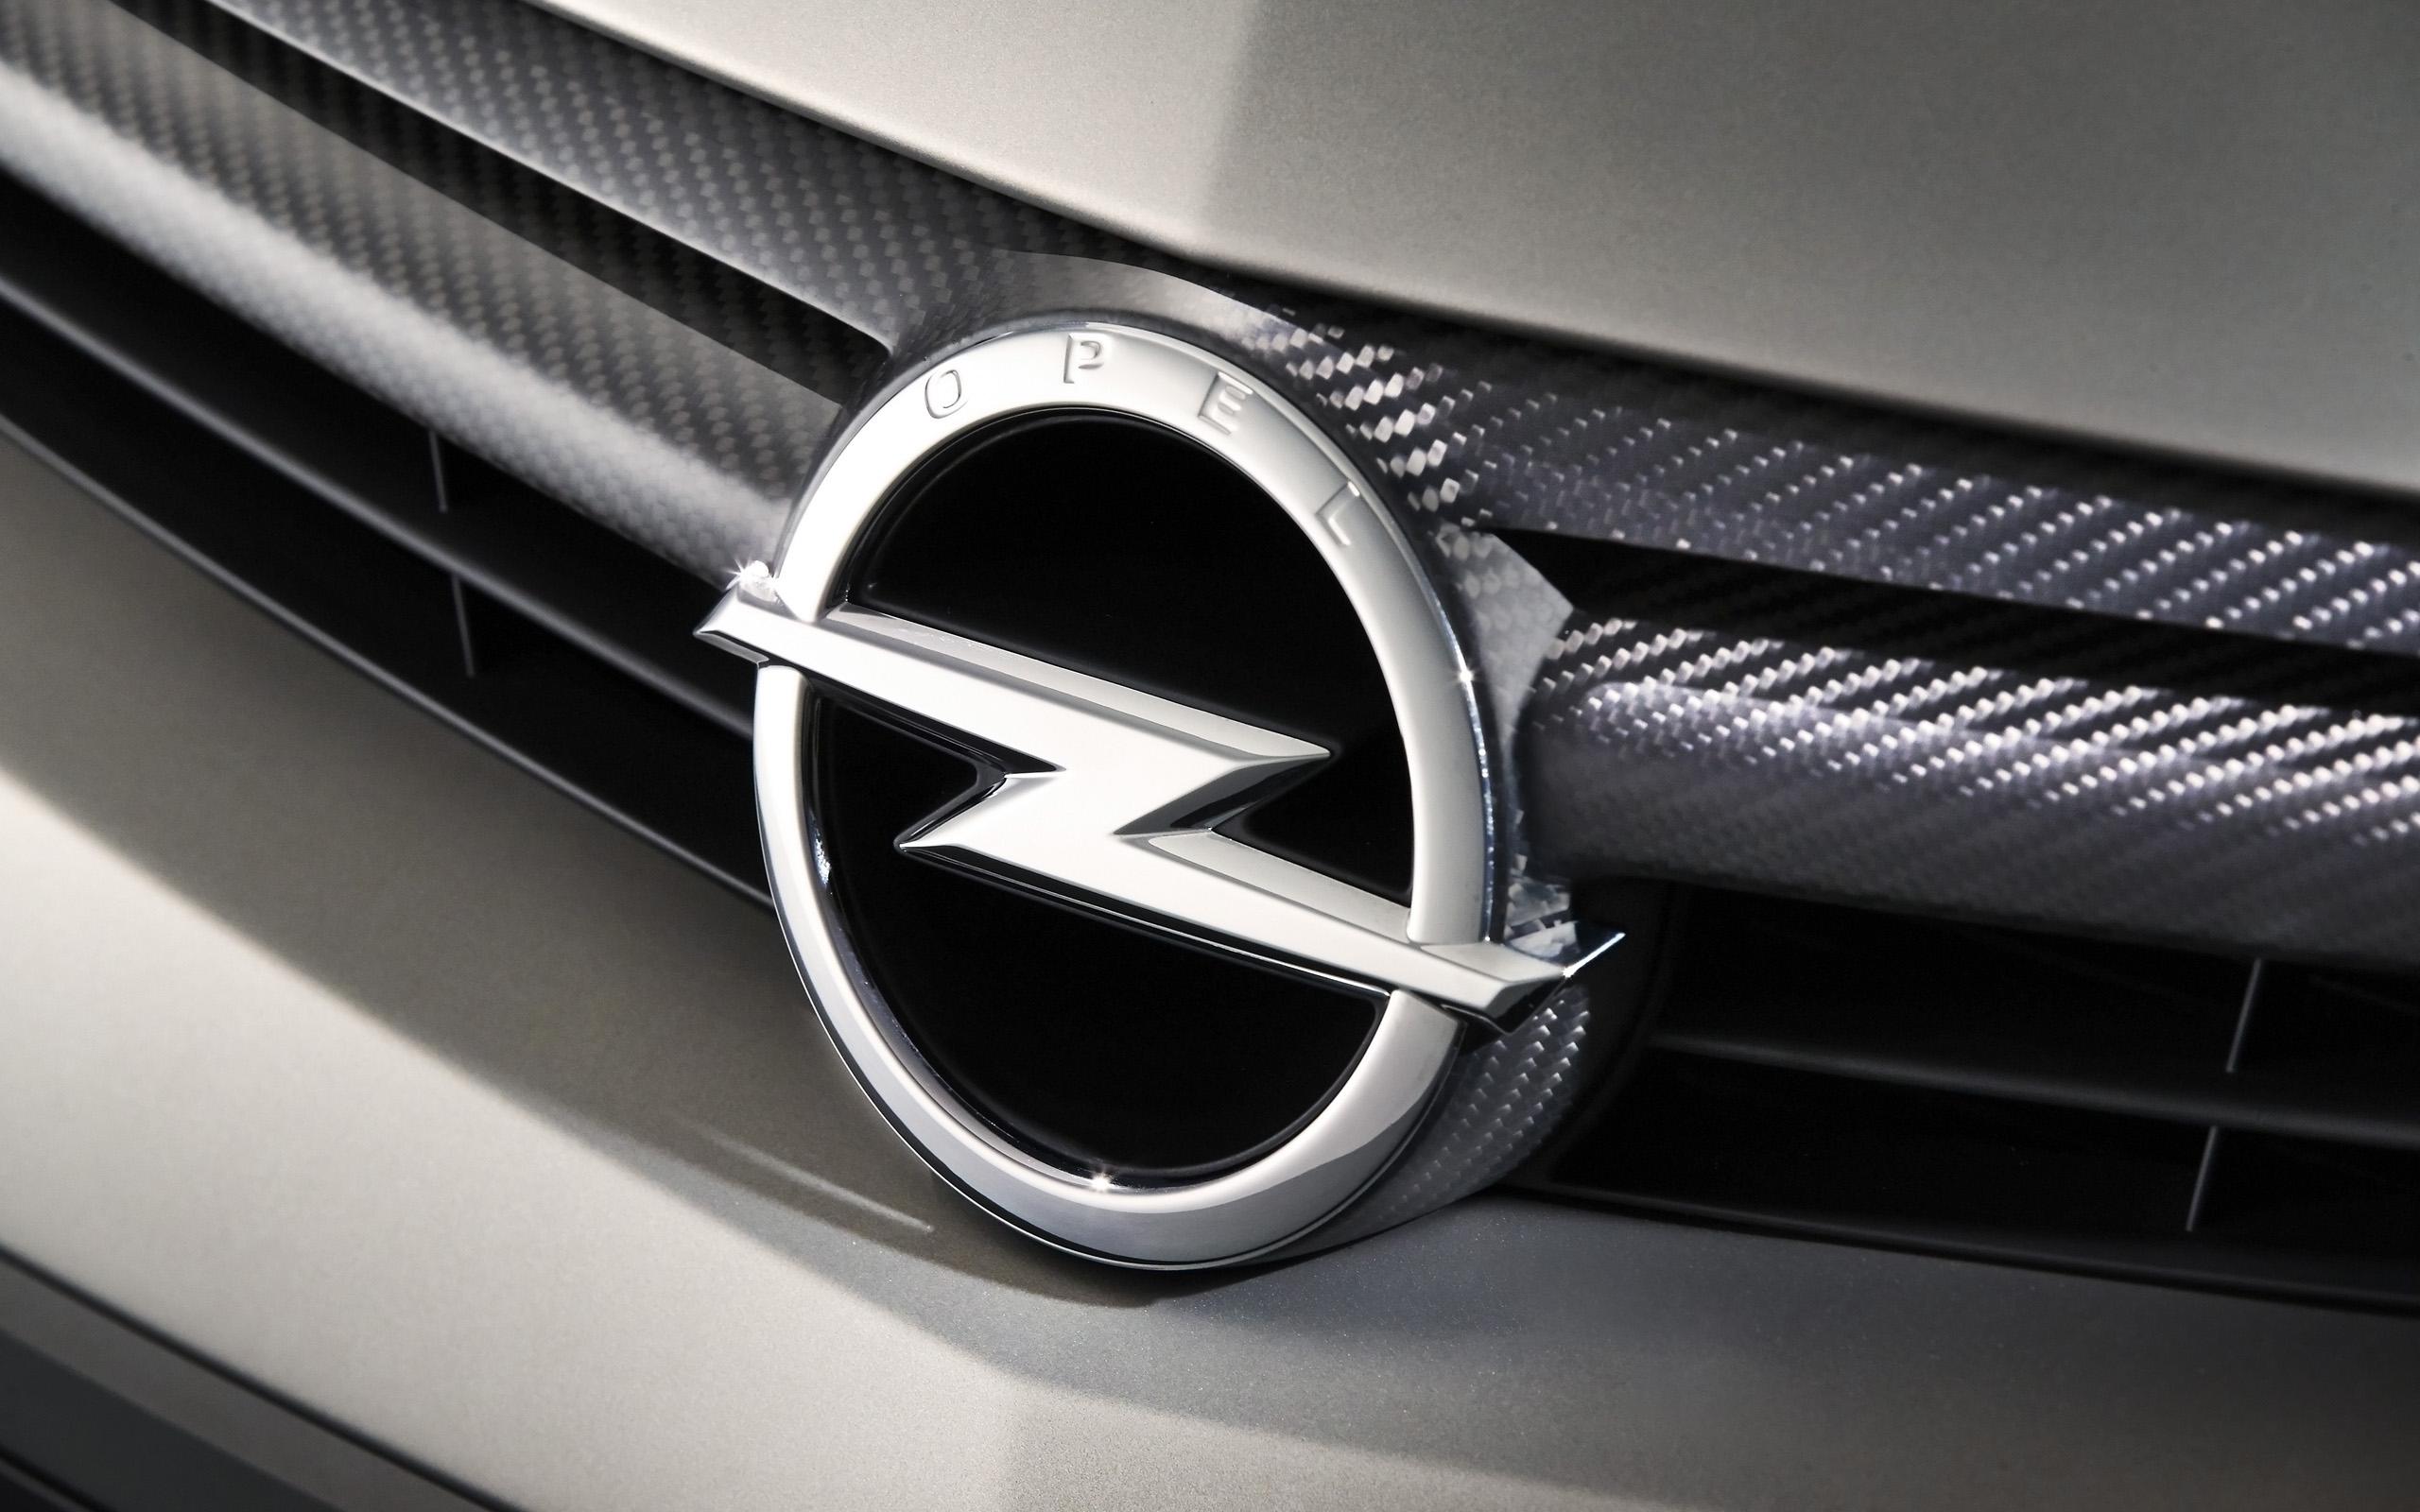 Opel Astra Wallpaper 9   2560 X 1600 stmednet 2560x1600